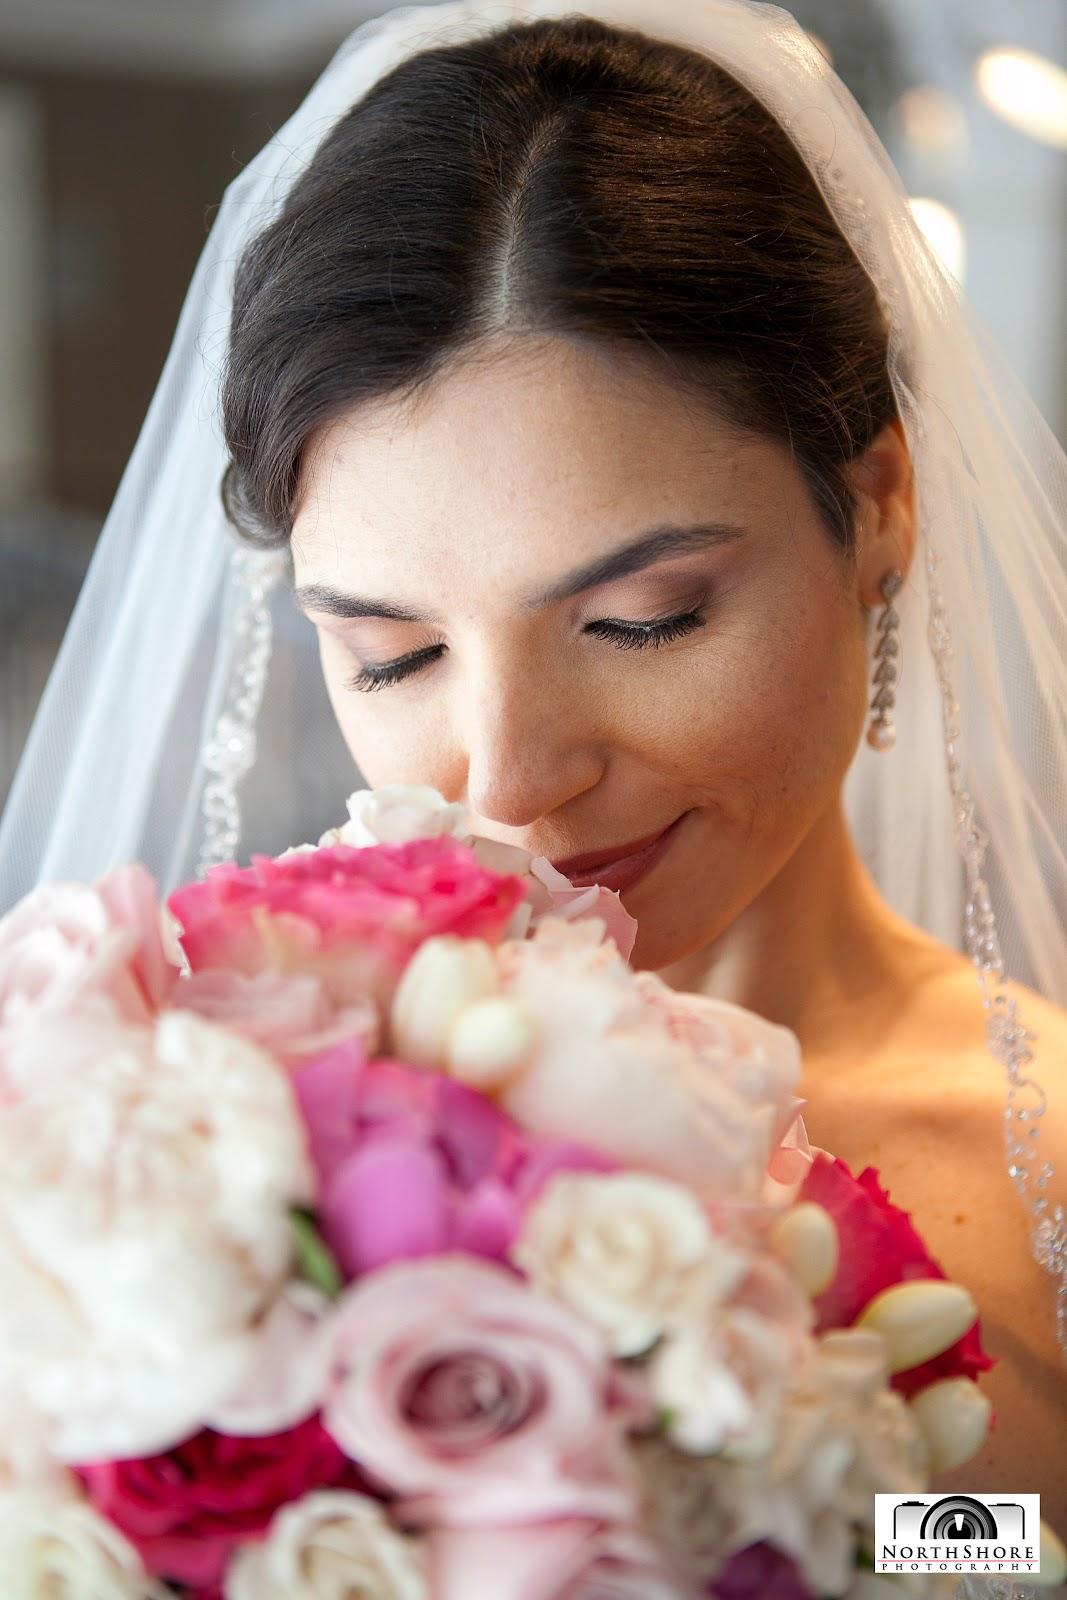 DIY Bridal Makeup Tips Part One